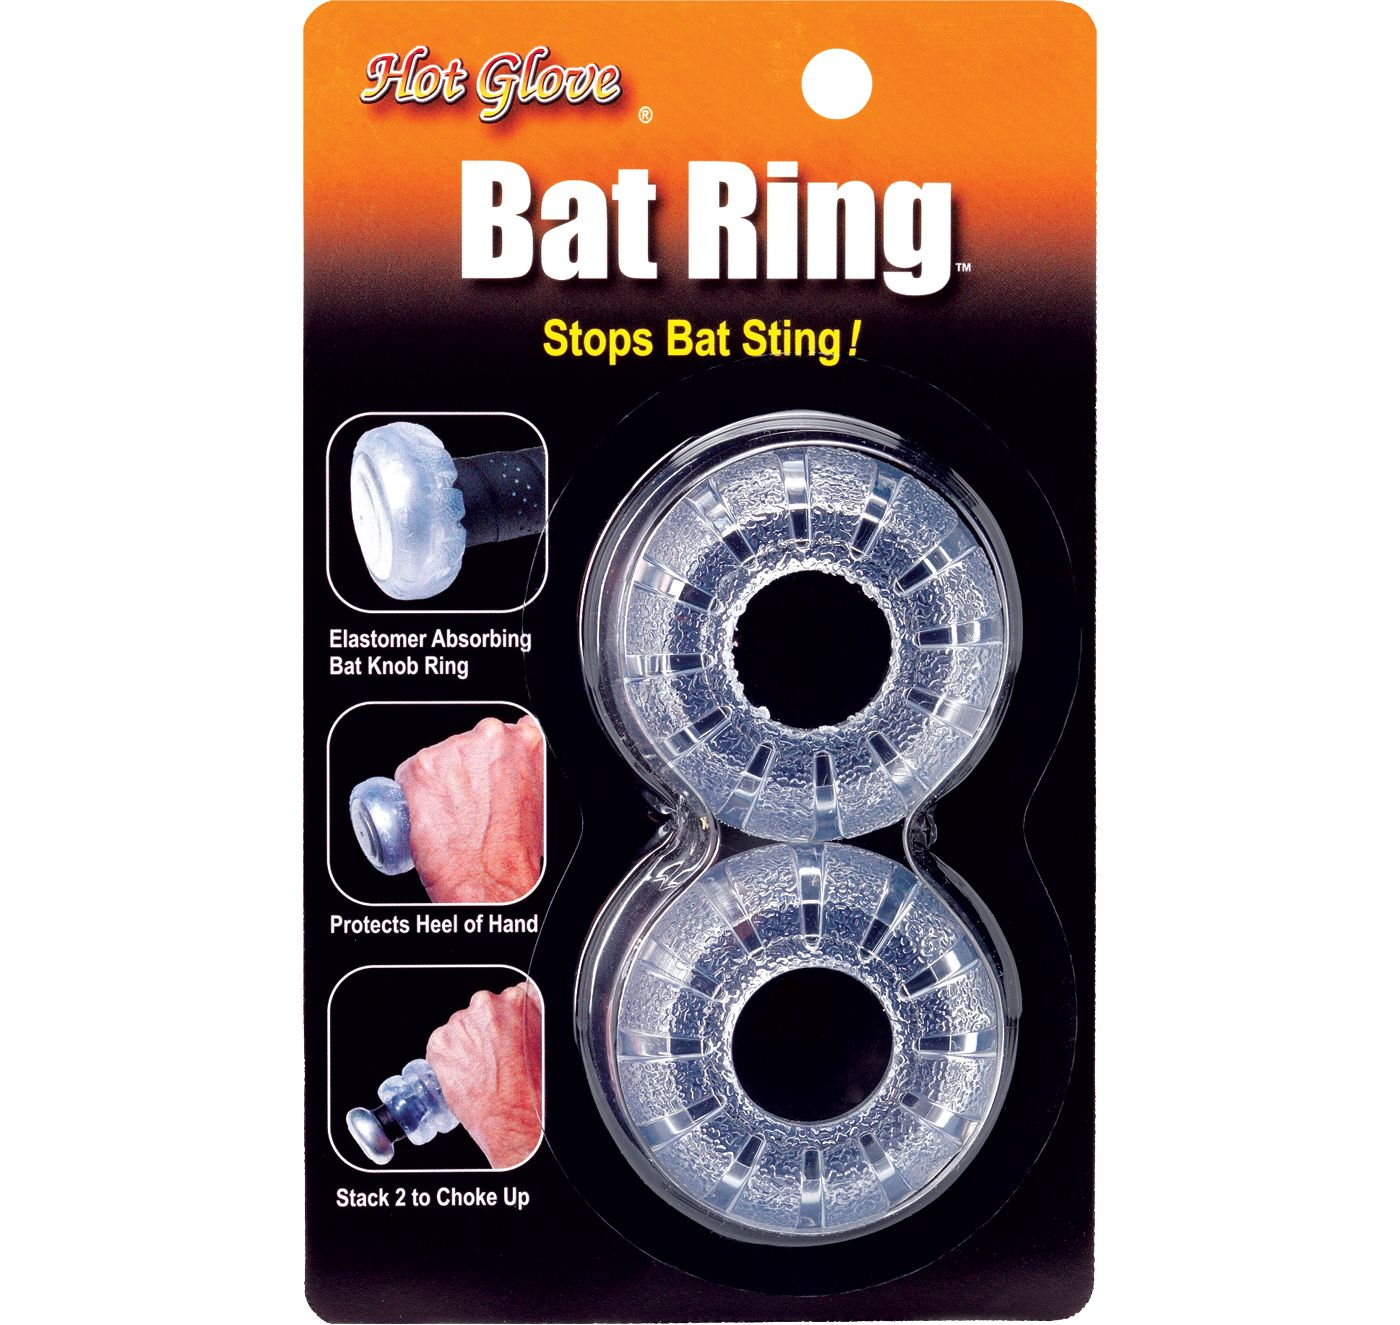 Hot Glove Bat Rings